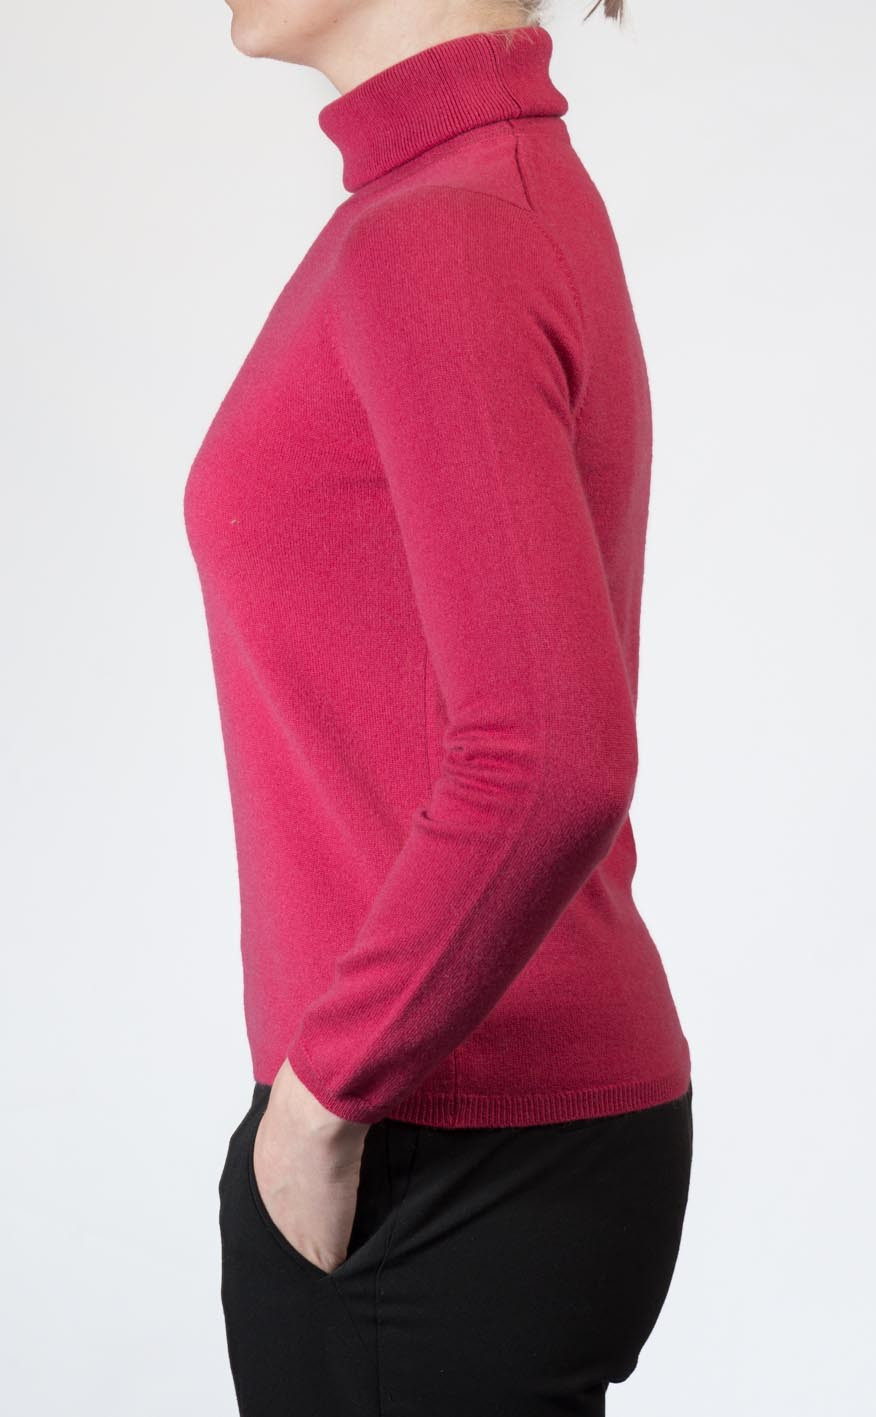 Colour: Protea